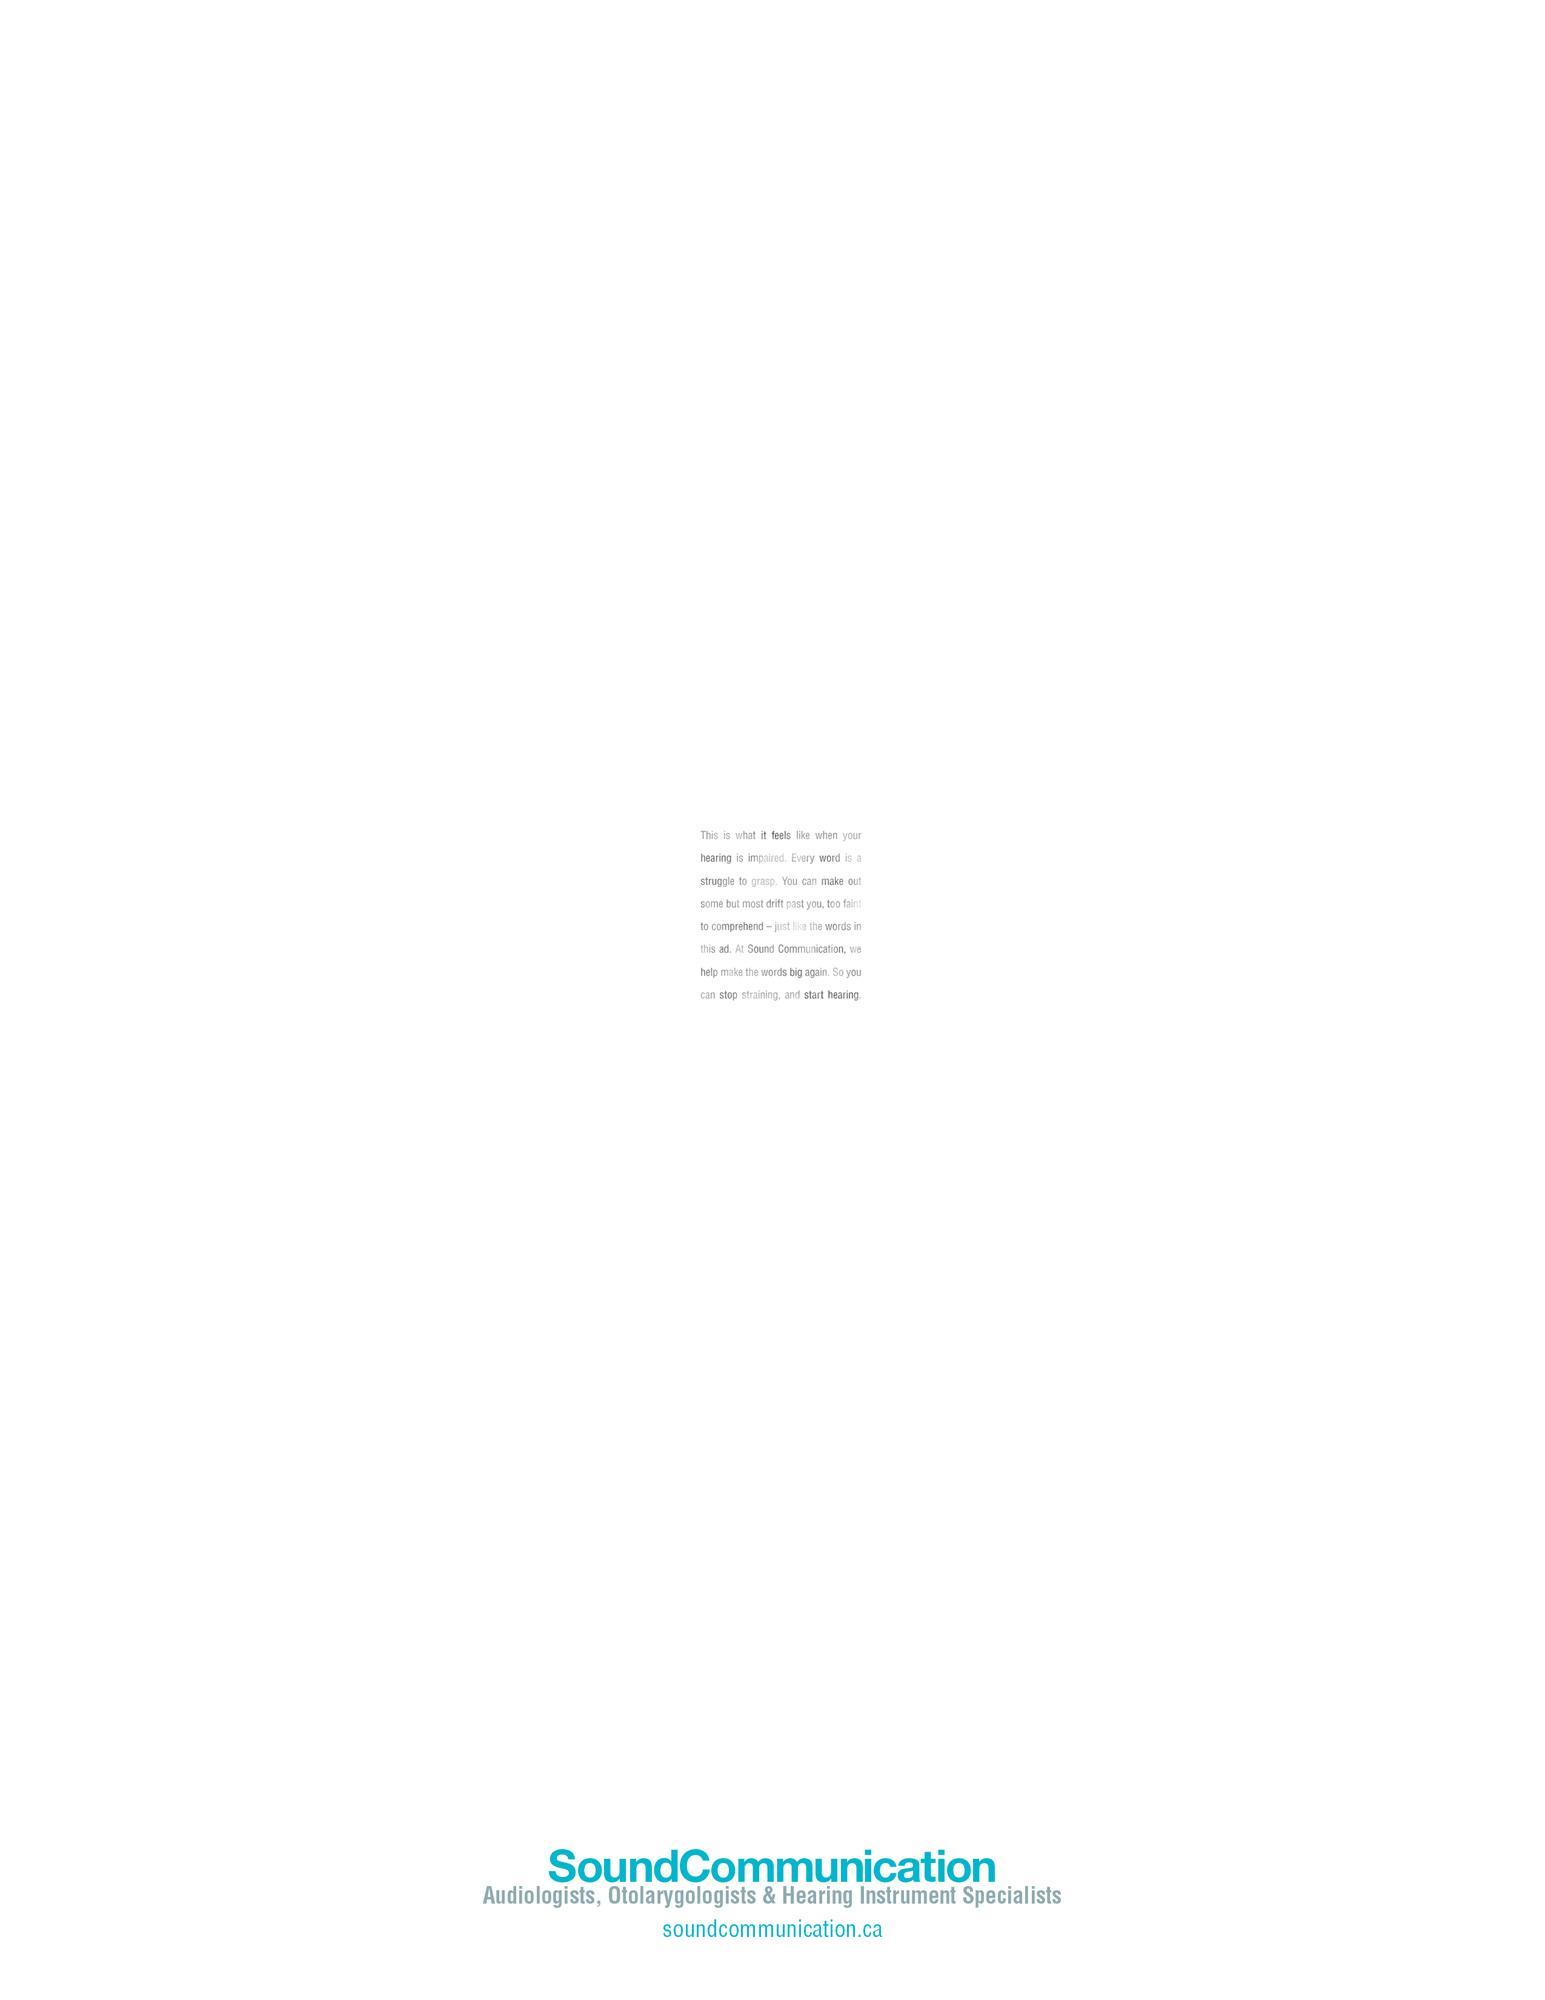 Sound Communication Print Ad -  Close-up, 1